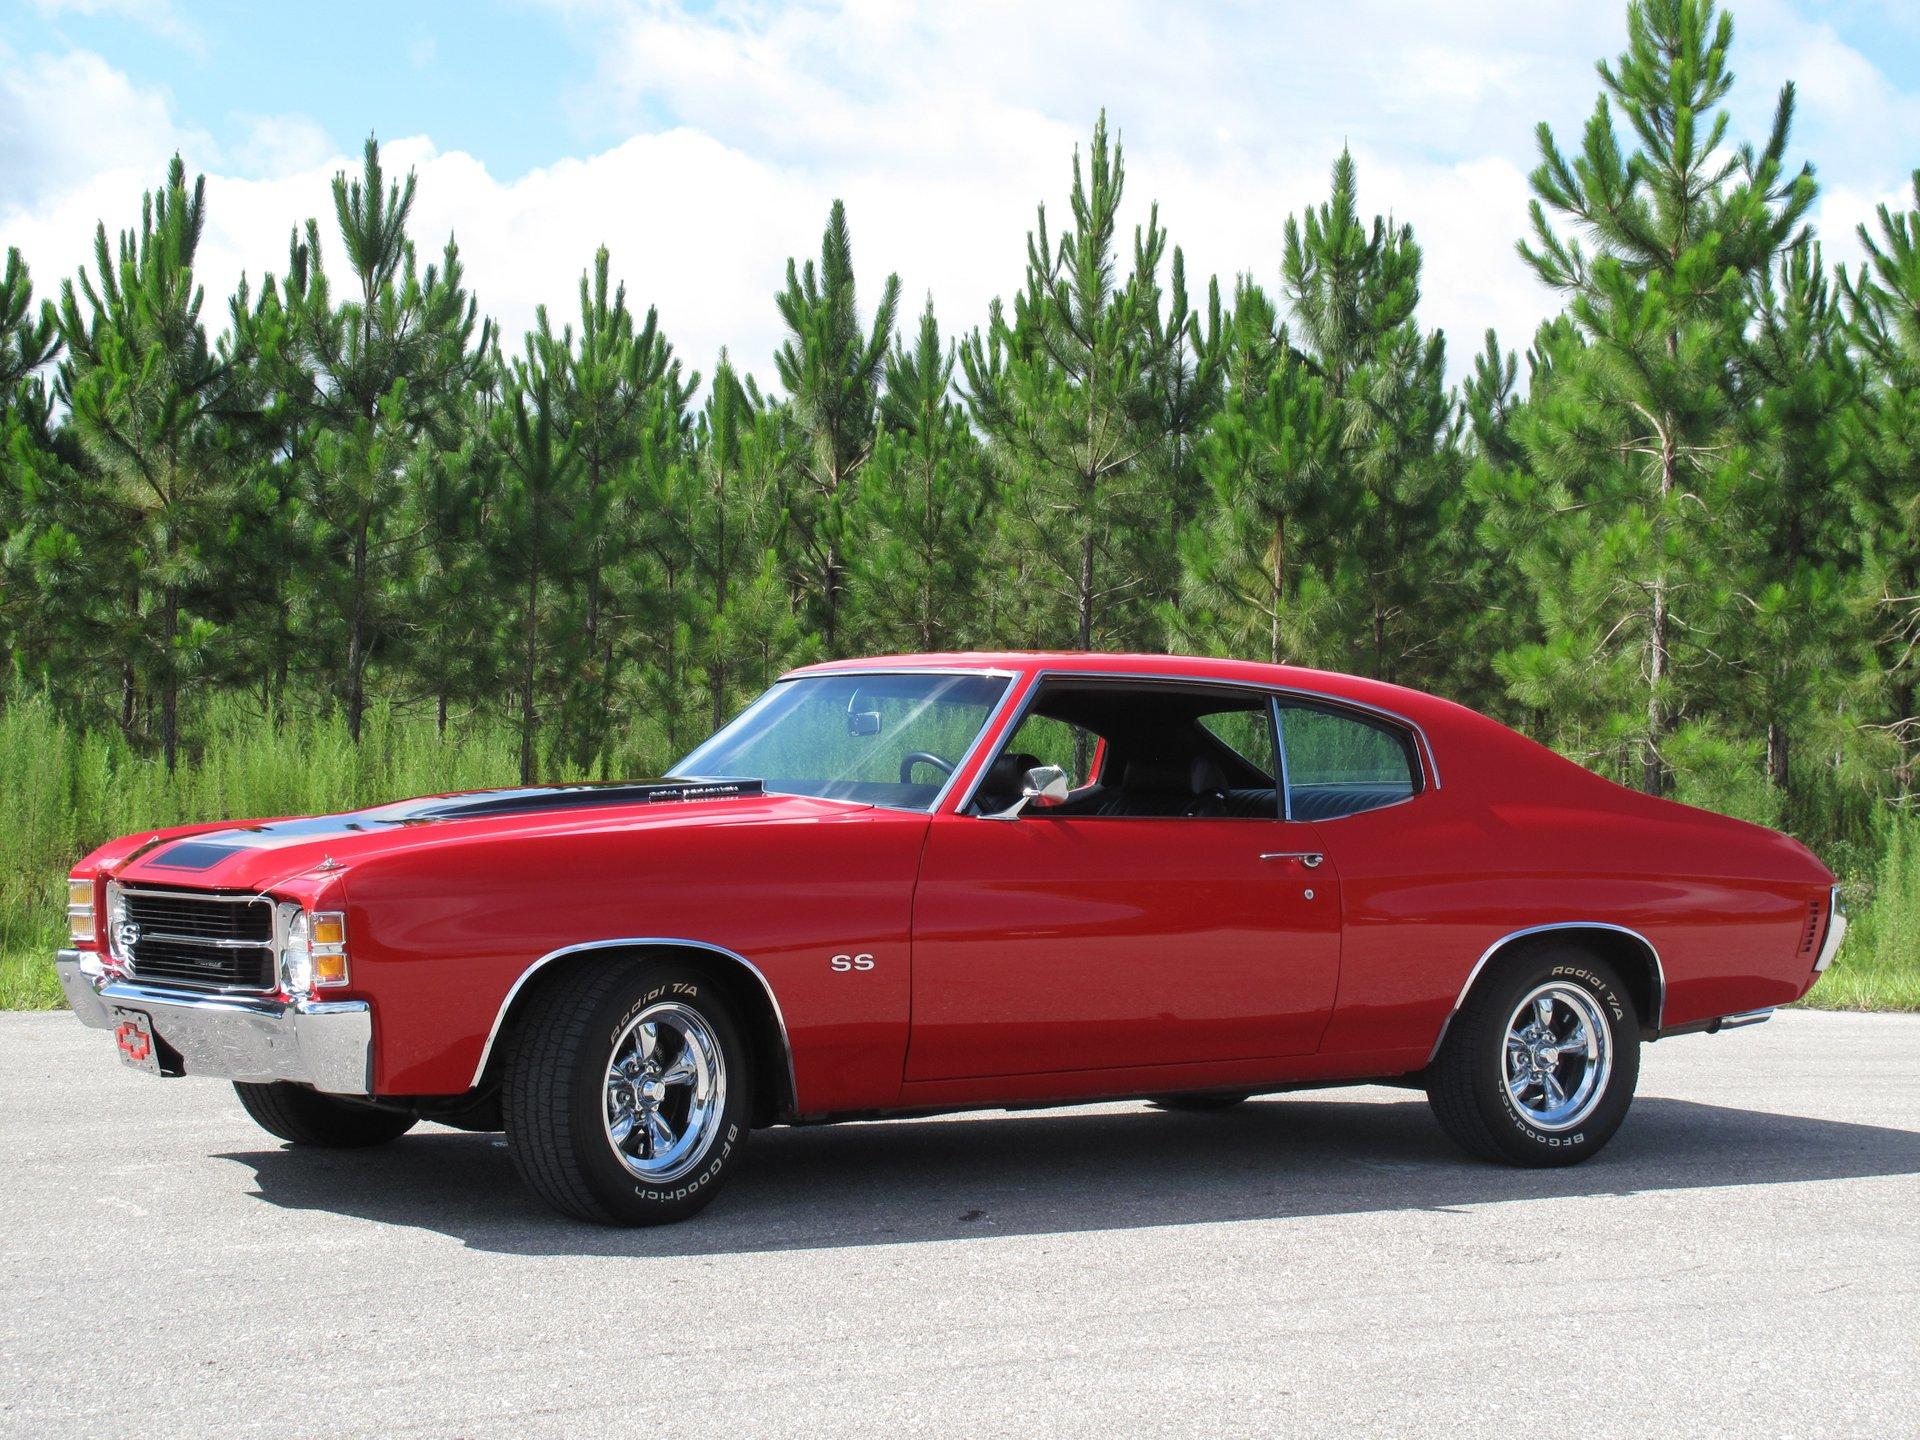 1971 chevrolet chevelle ss clone